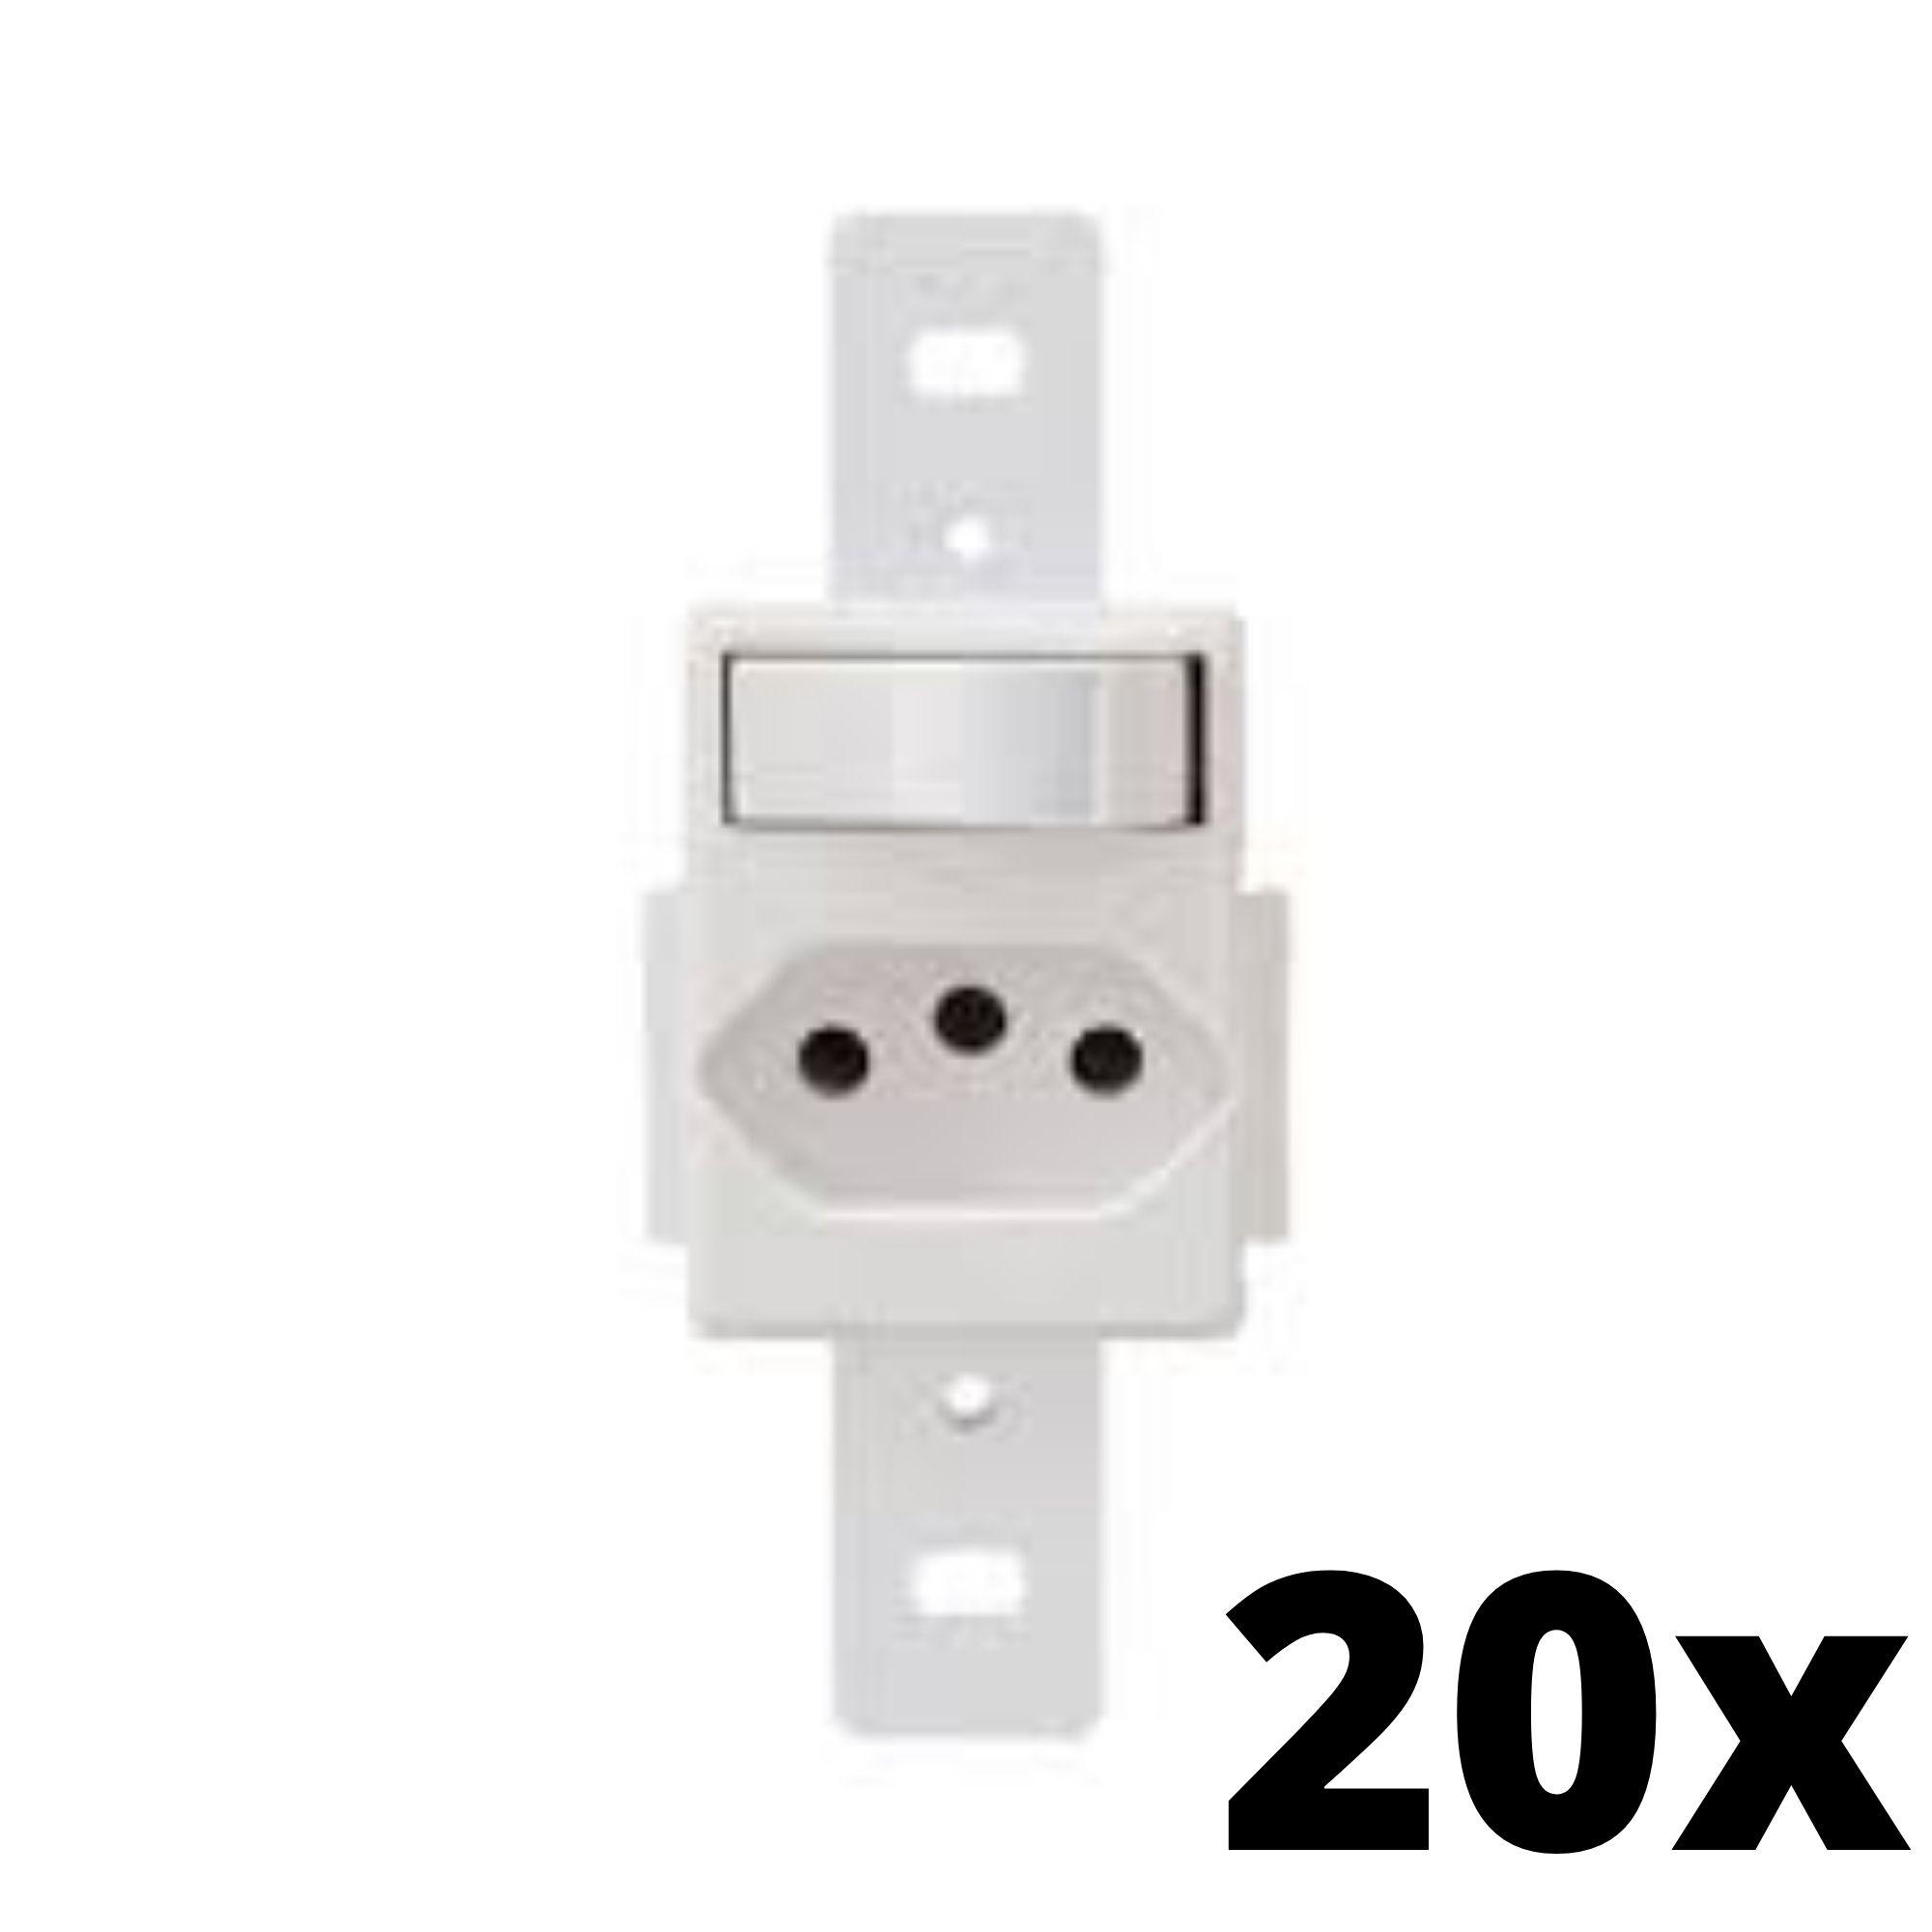 Kit 20 und Blanc 1Seção Interruptor Simples+1Seção Tomada 10A Sem Placa